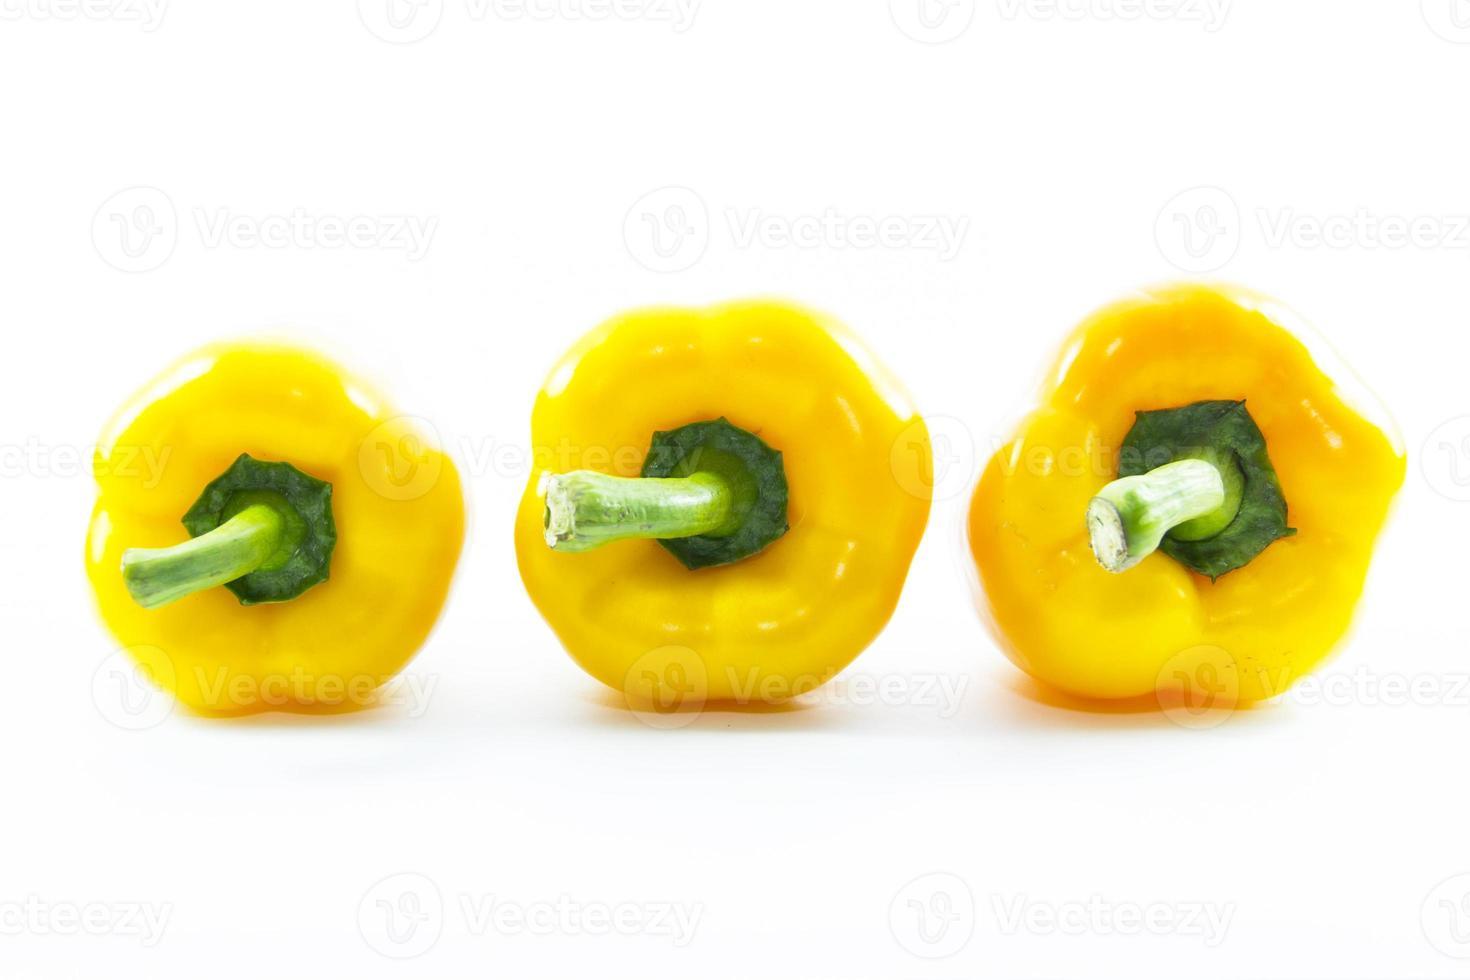 rad gul chili capsicum i olika storlek foto